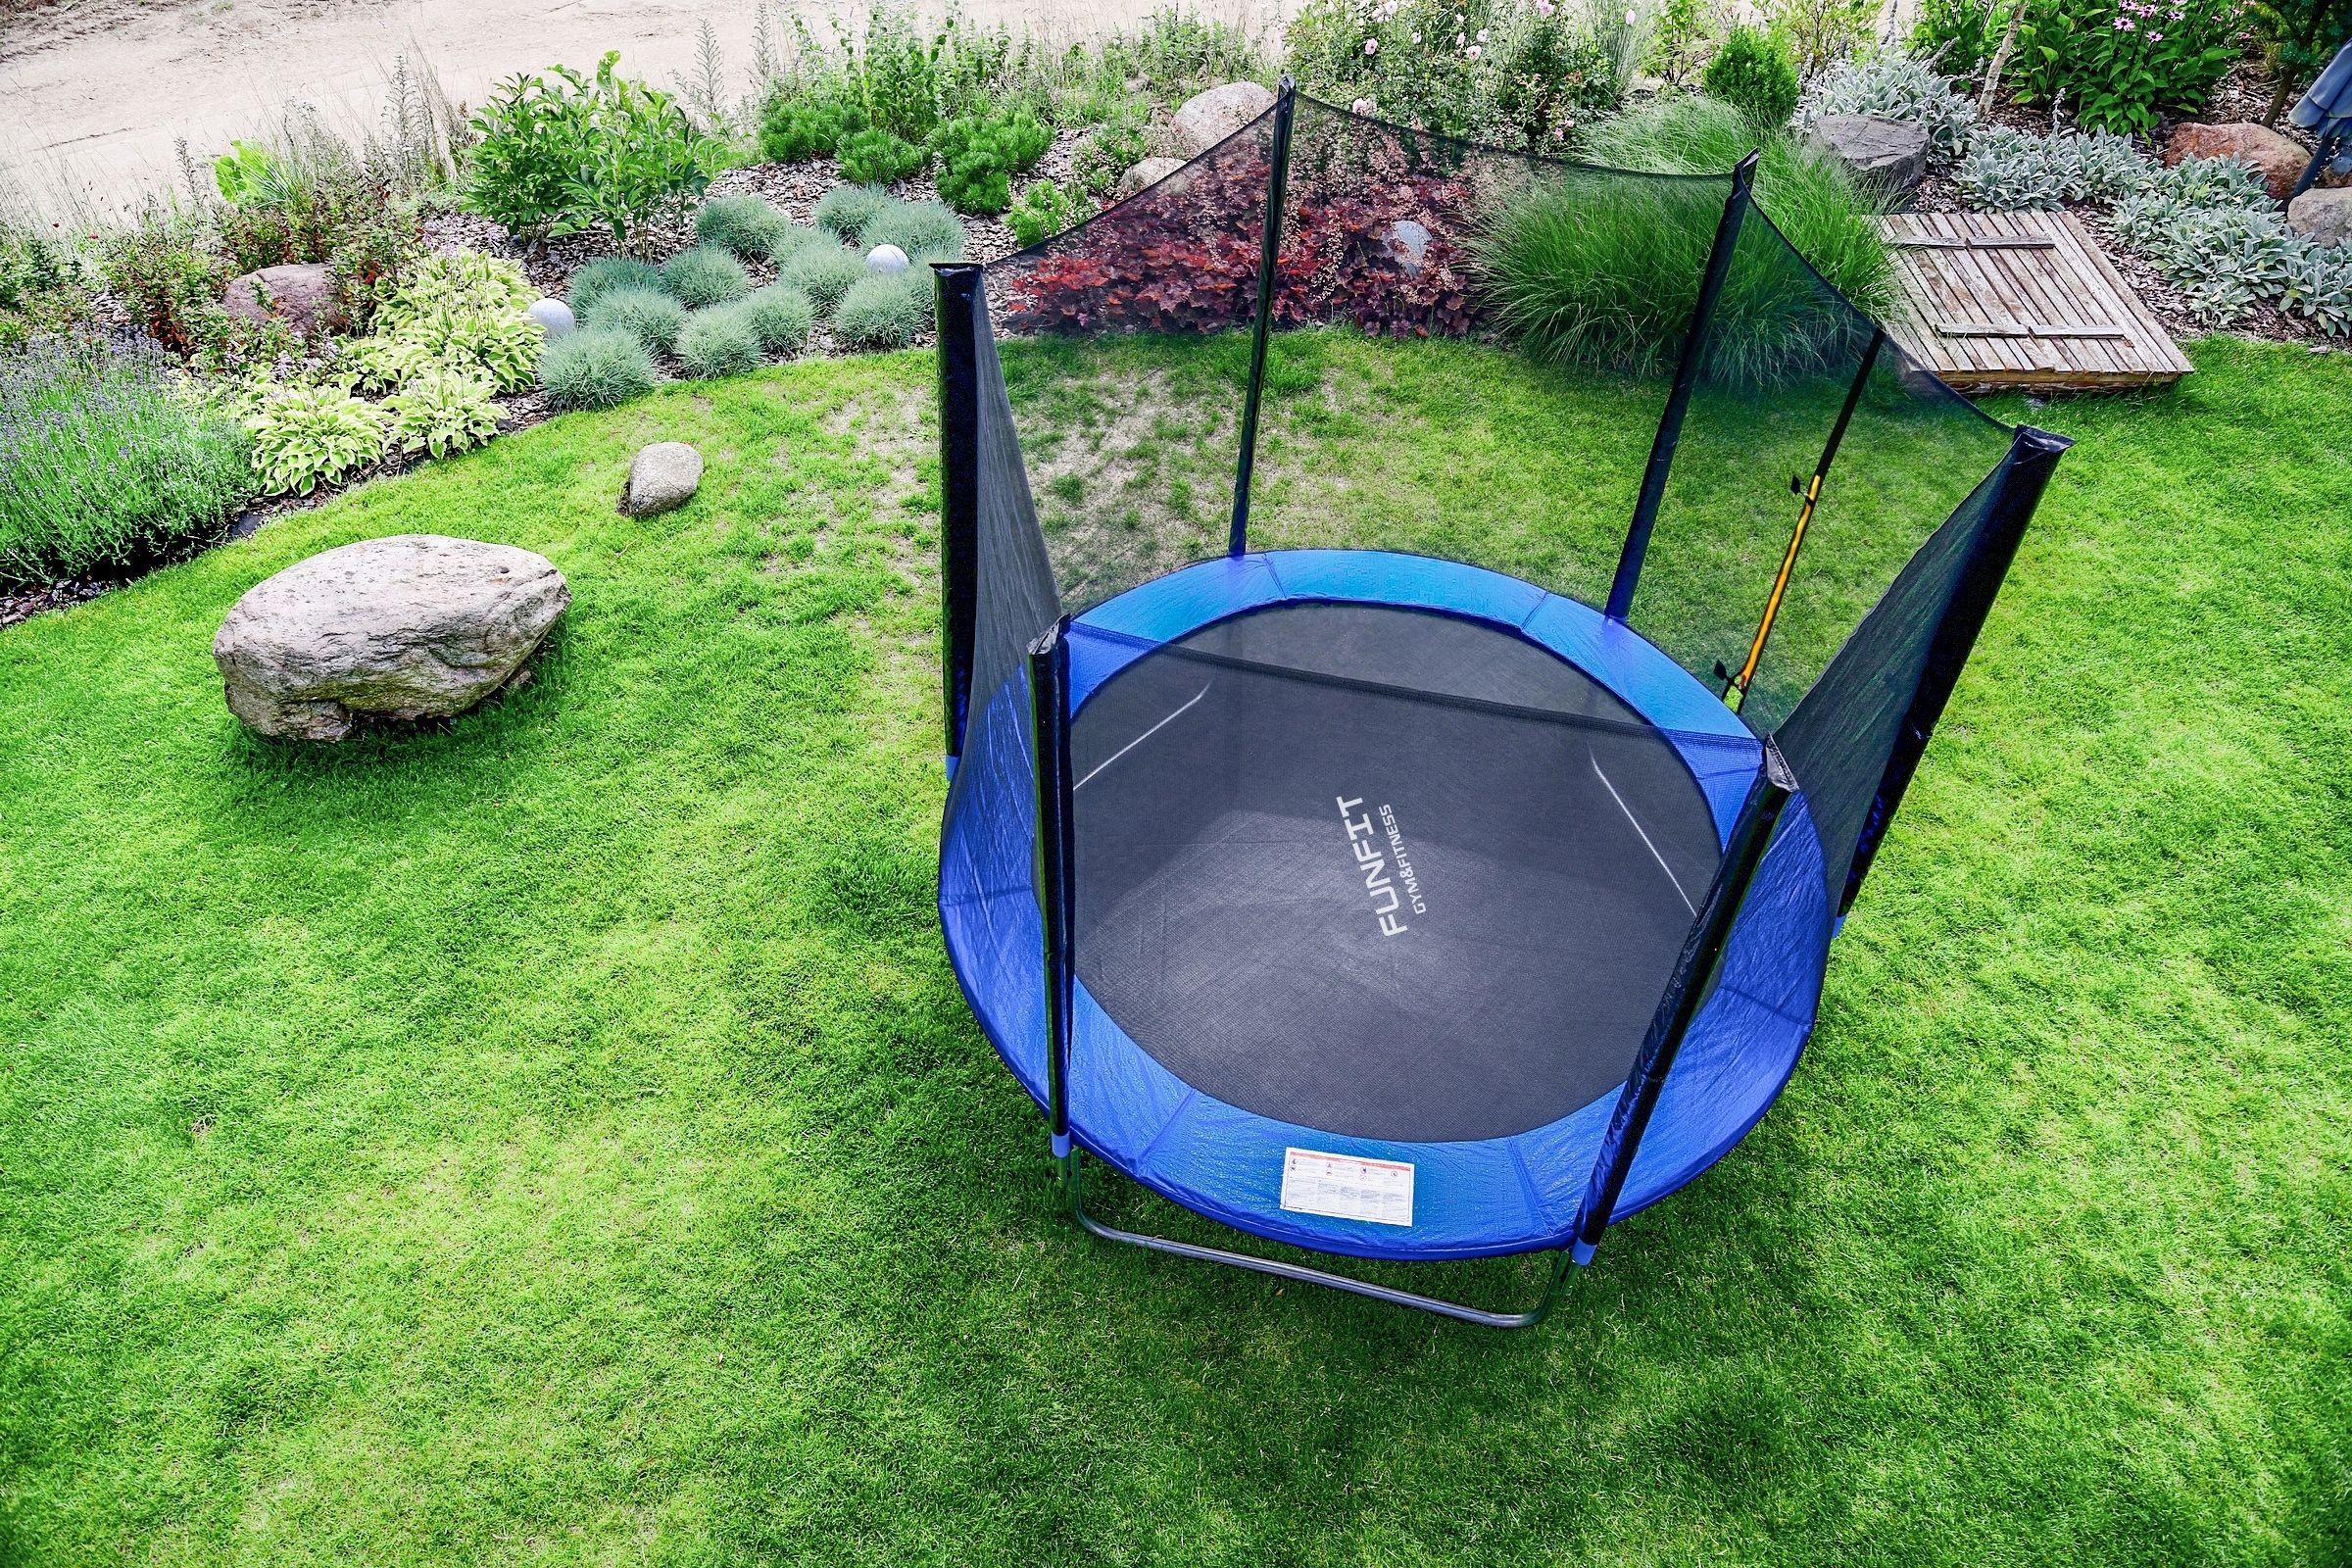 Trampolina Ogrodowa 252cm Z Siatka Drabinka Funfit 7834498013 Allegro Pl Outdoor Gear Outdoor Tent